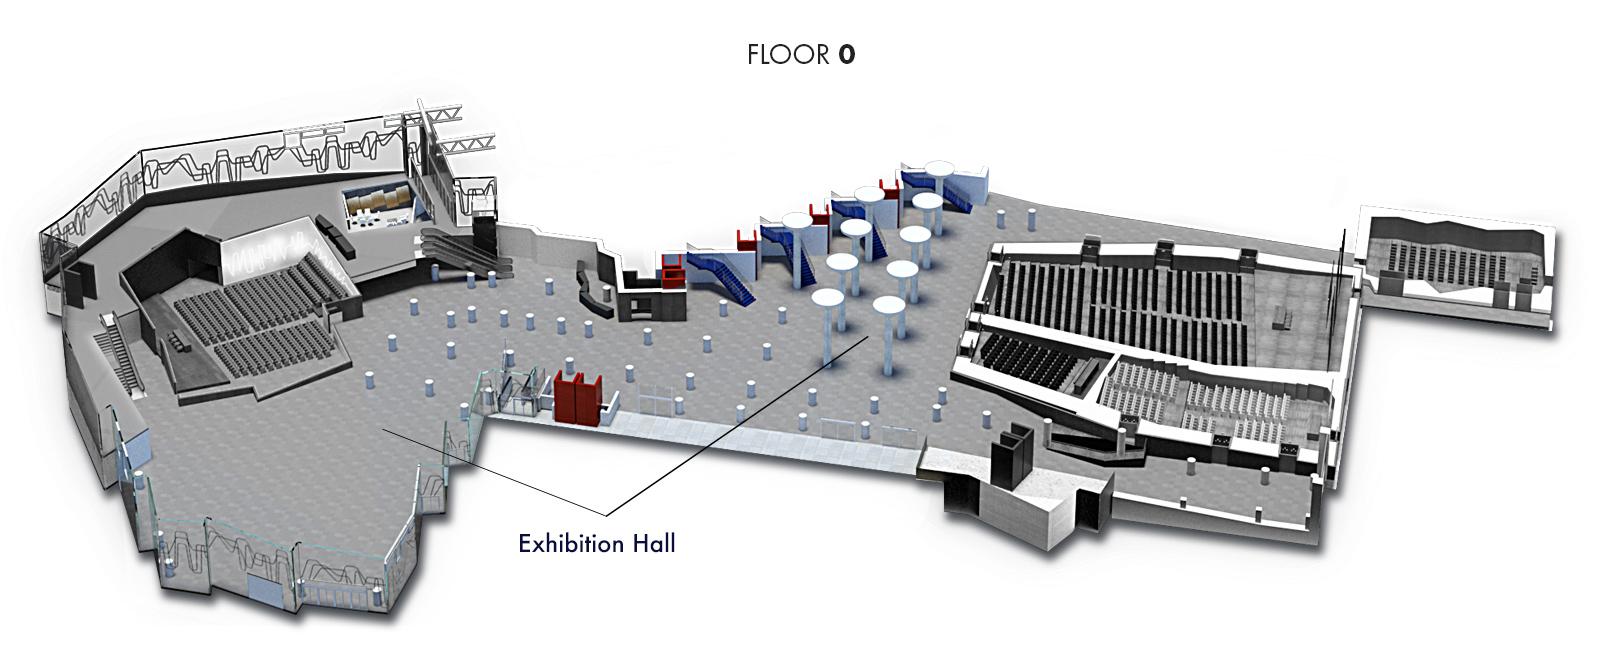 Exhibition Hall, Floor 0 | Palacio Euskalduna Jauregia